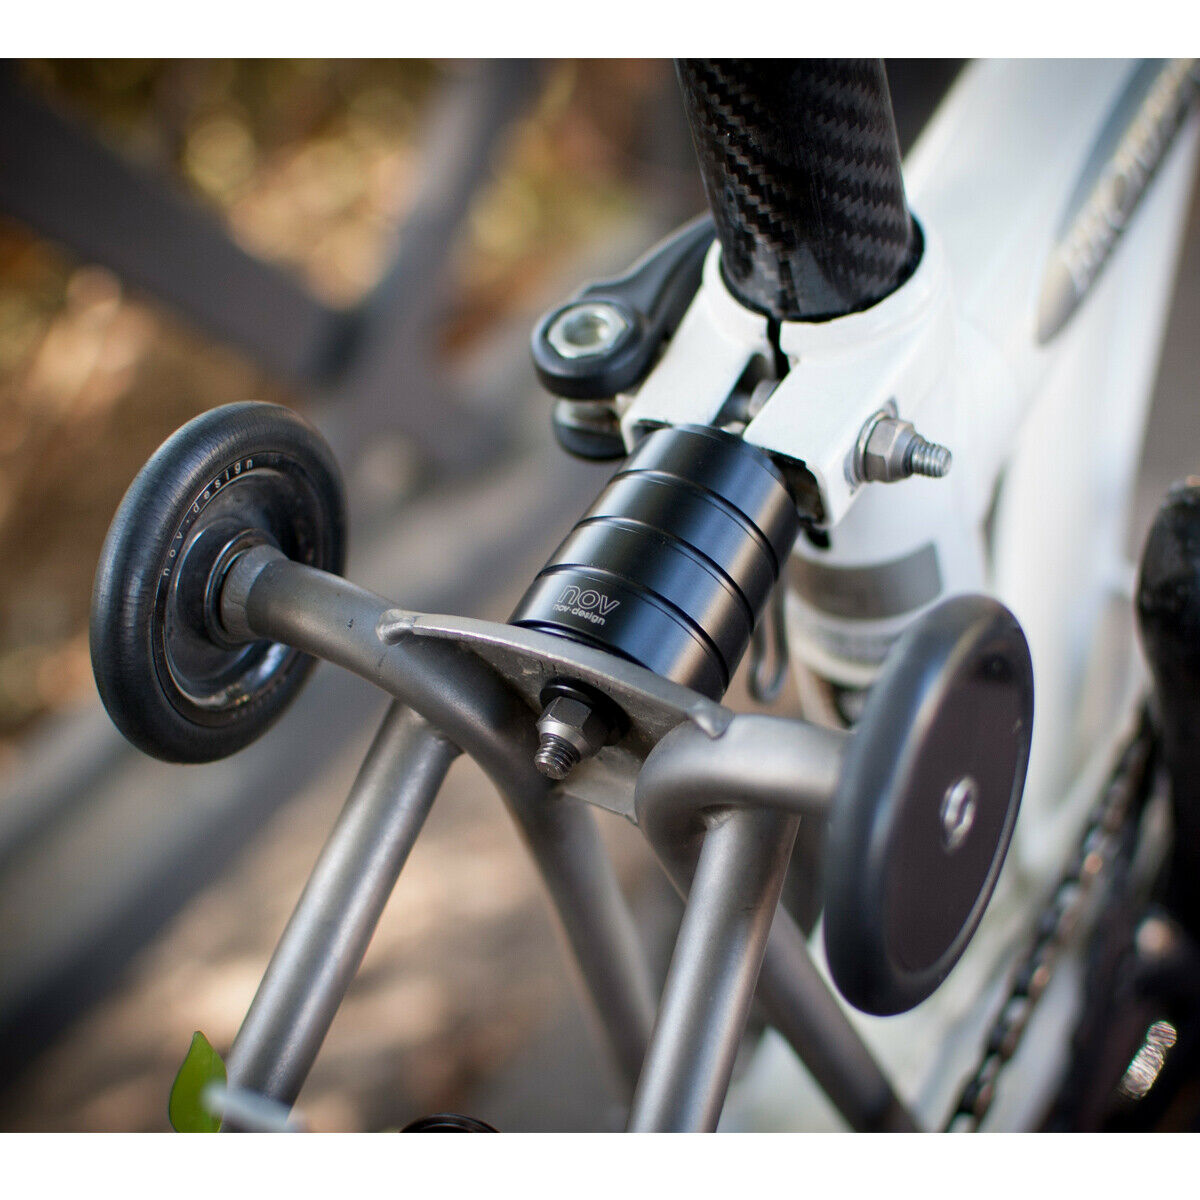 nov Suspension Block Racing Shock series light weight for Brompton Folding Bike